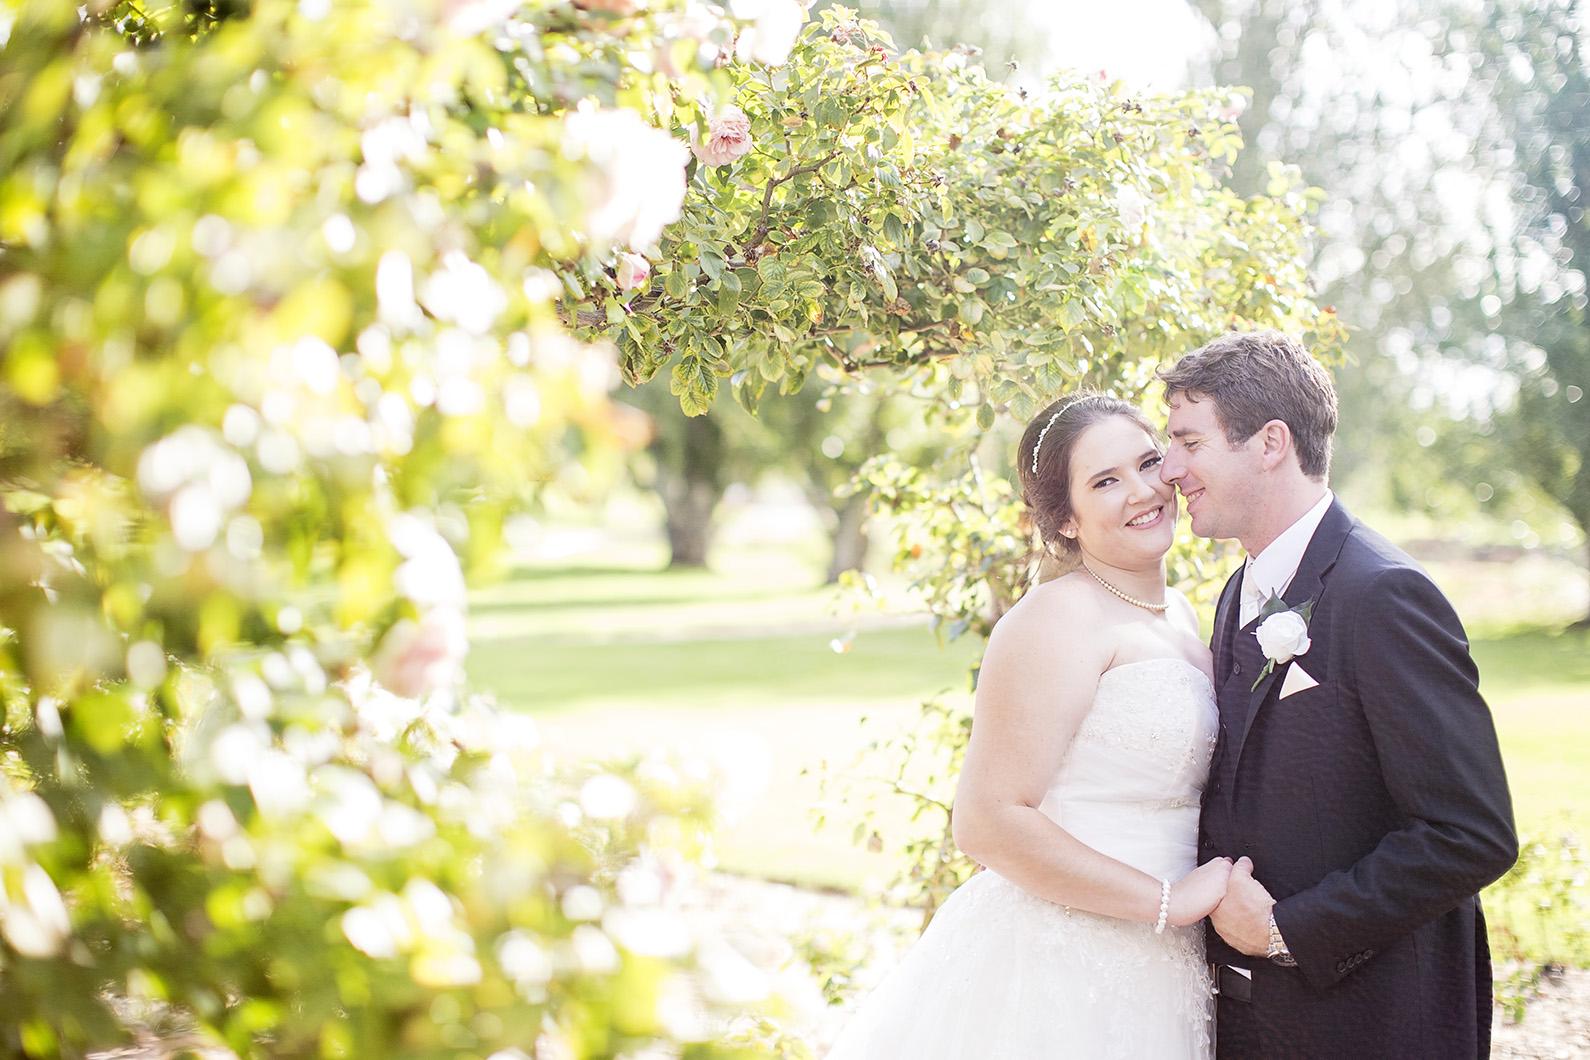 Dreamy Adelaide Veal Gardens Wedding Photo 09.jpg